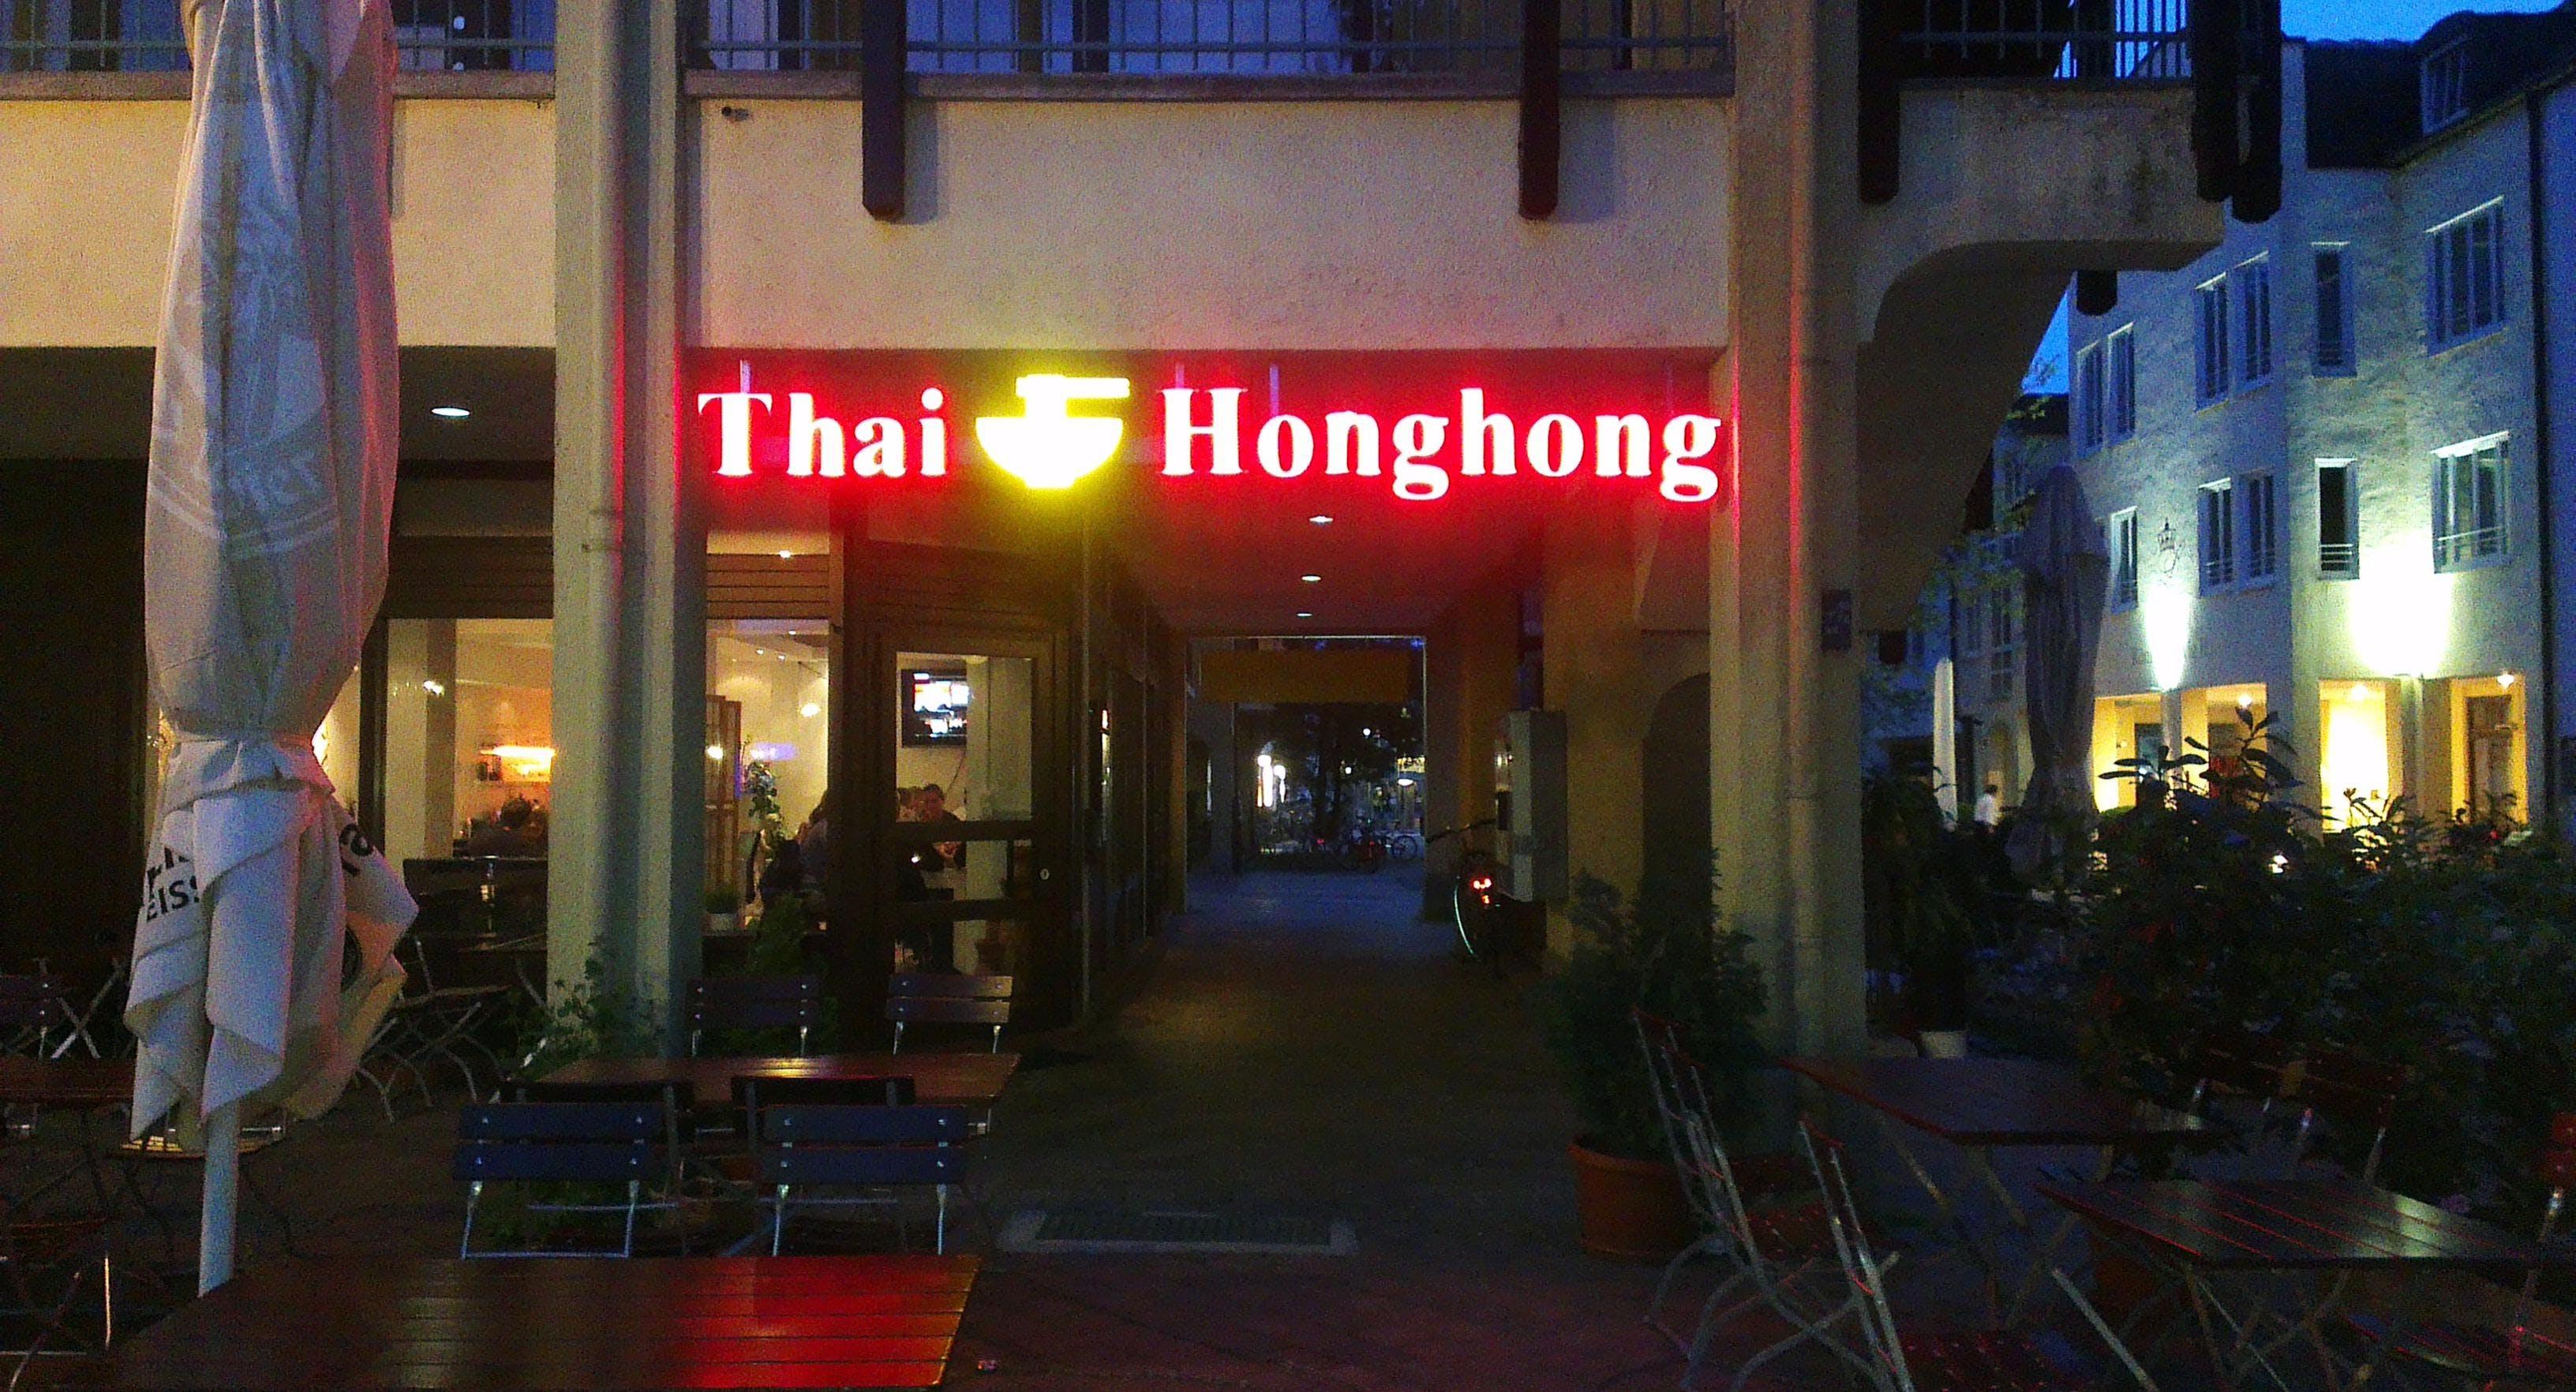 Honghong Restaurant Garching München image 1